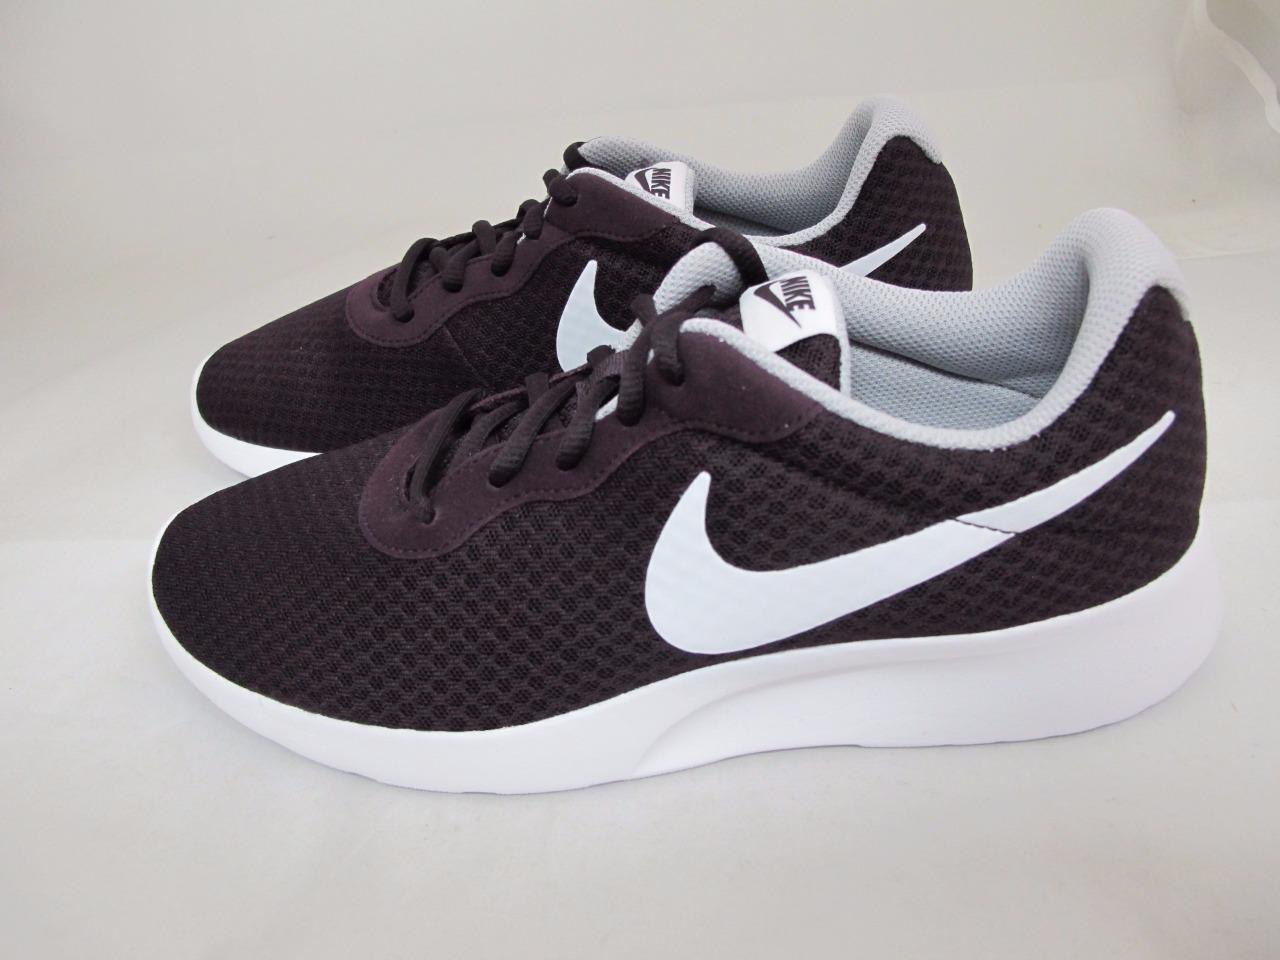 Nuevo Para Hombre Nike Tanjun 812654-600